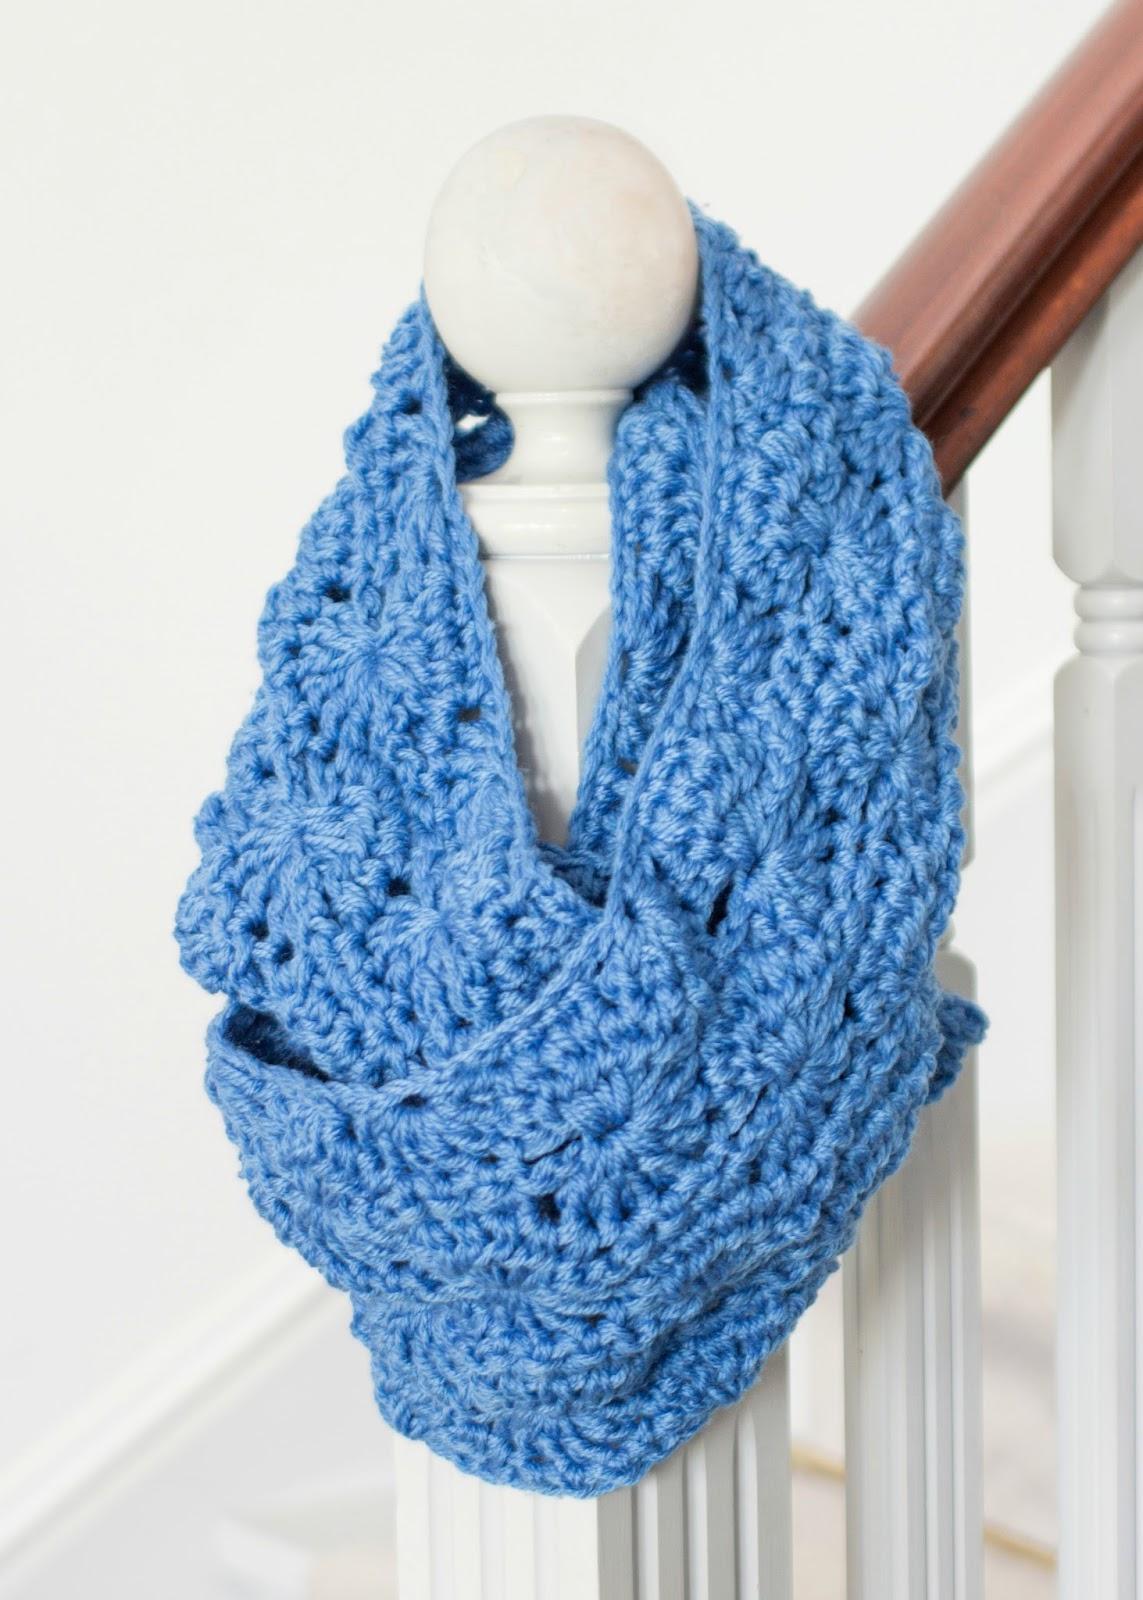 Crochet Infinity Scarf Chunky Pattern : Hopeful Honey Craft, Crochet, Create: Chunky Infinity ...